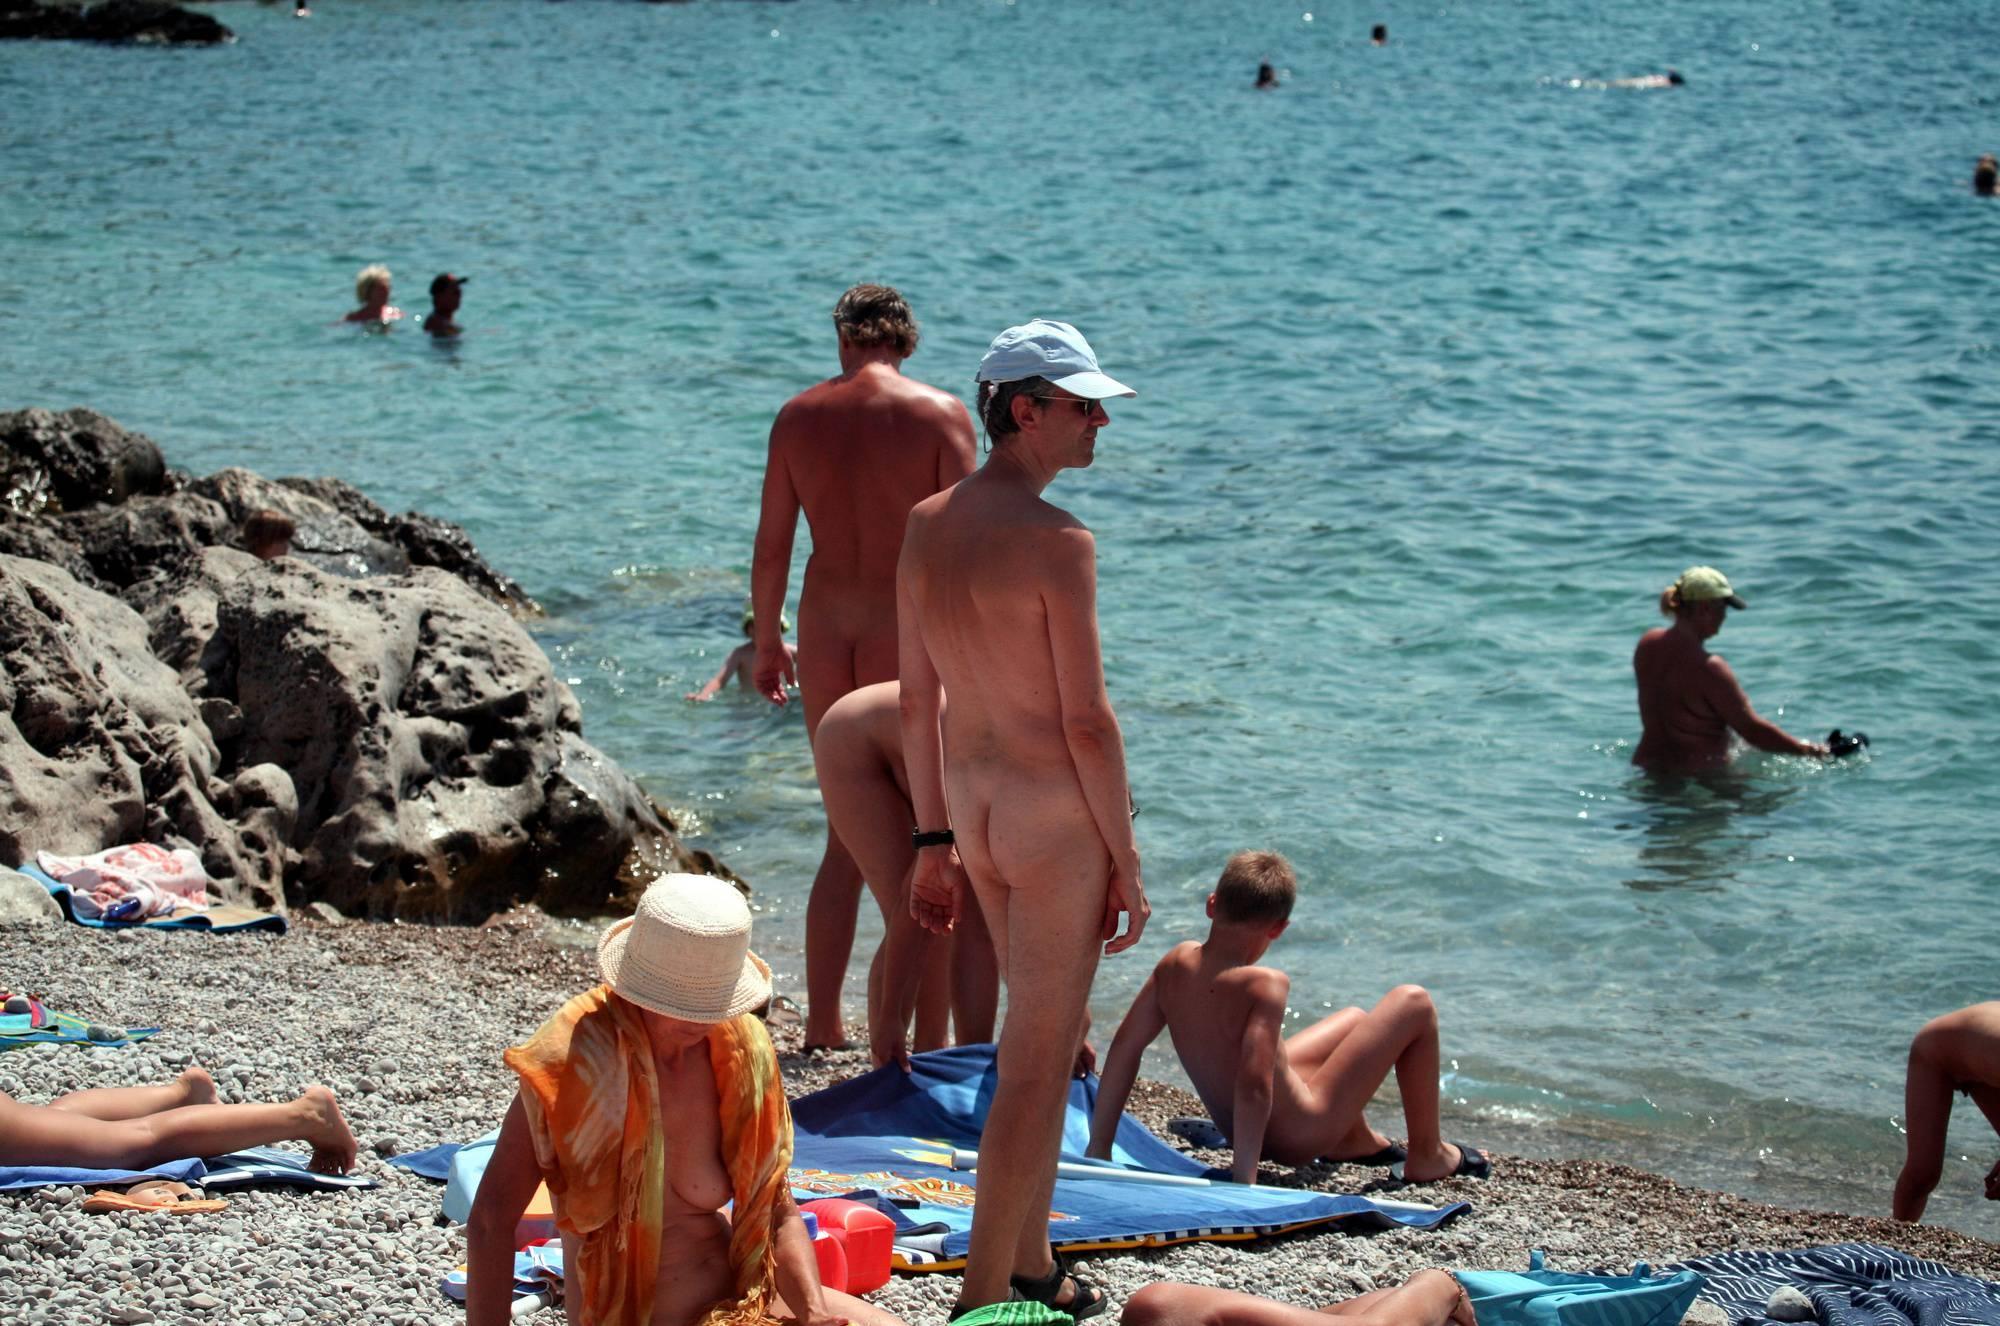 Purenudism Images-Nudist Family Water Camp - 3